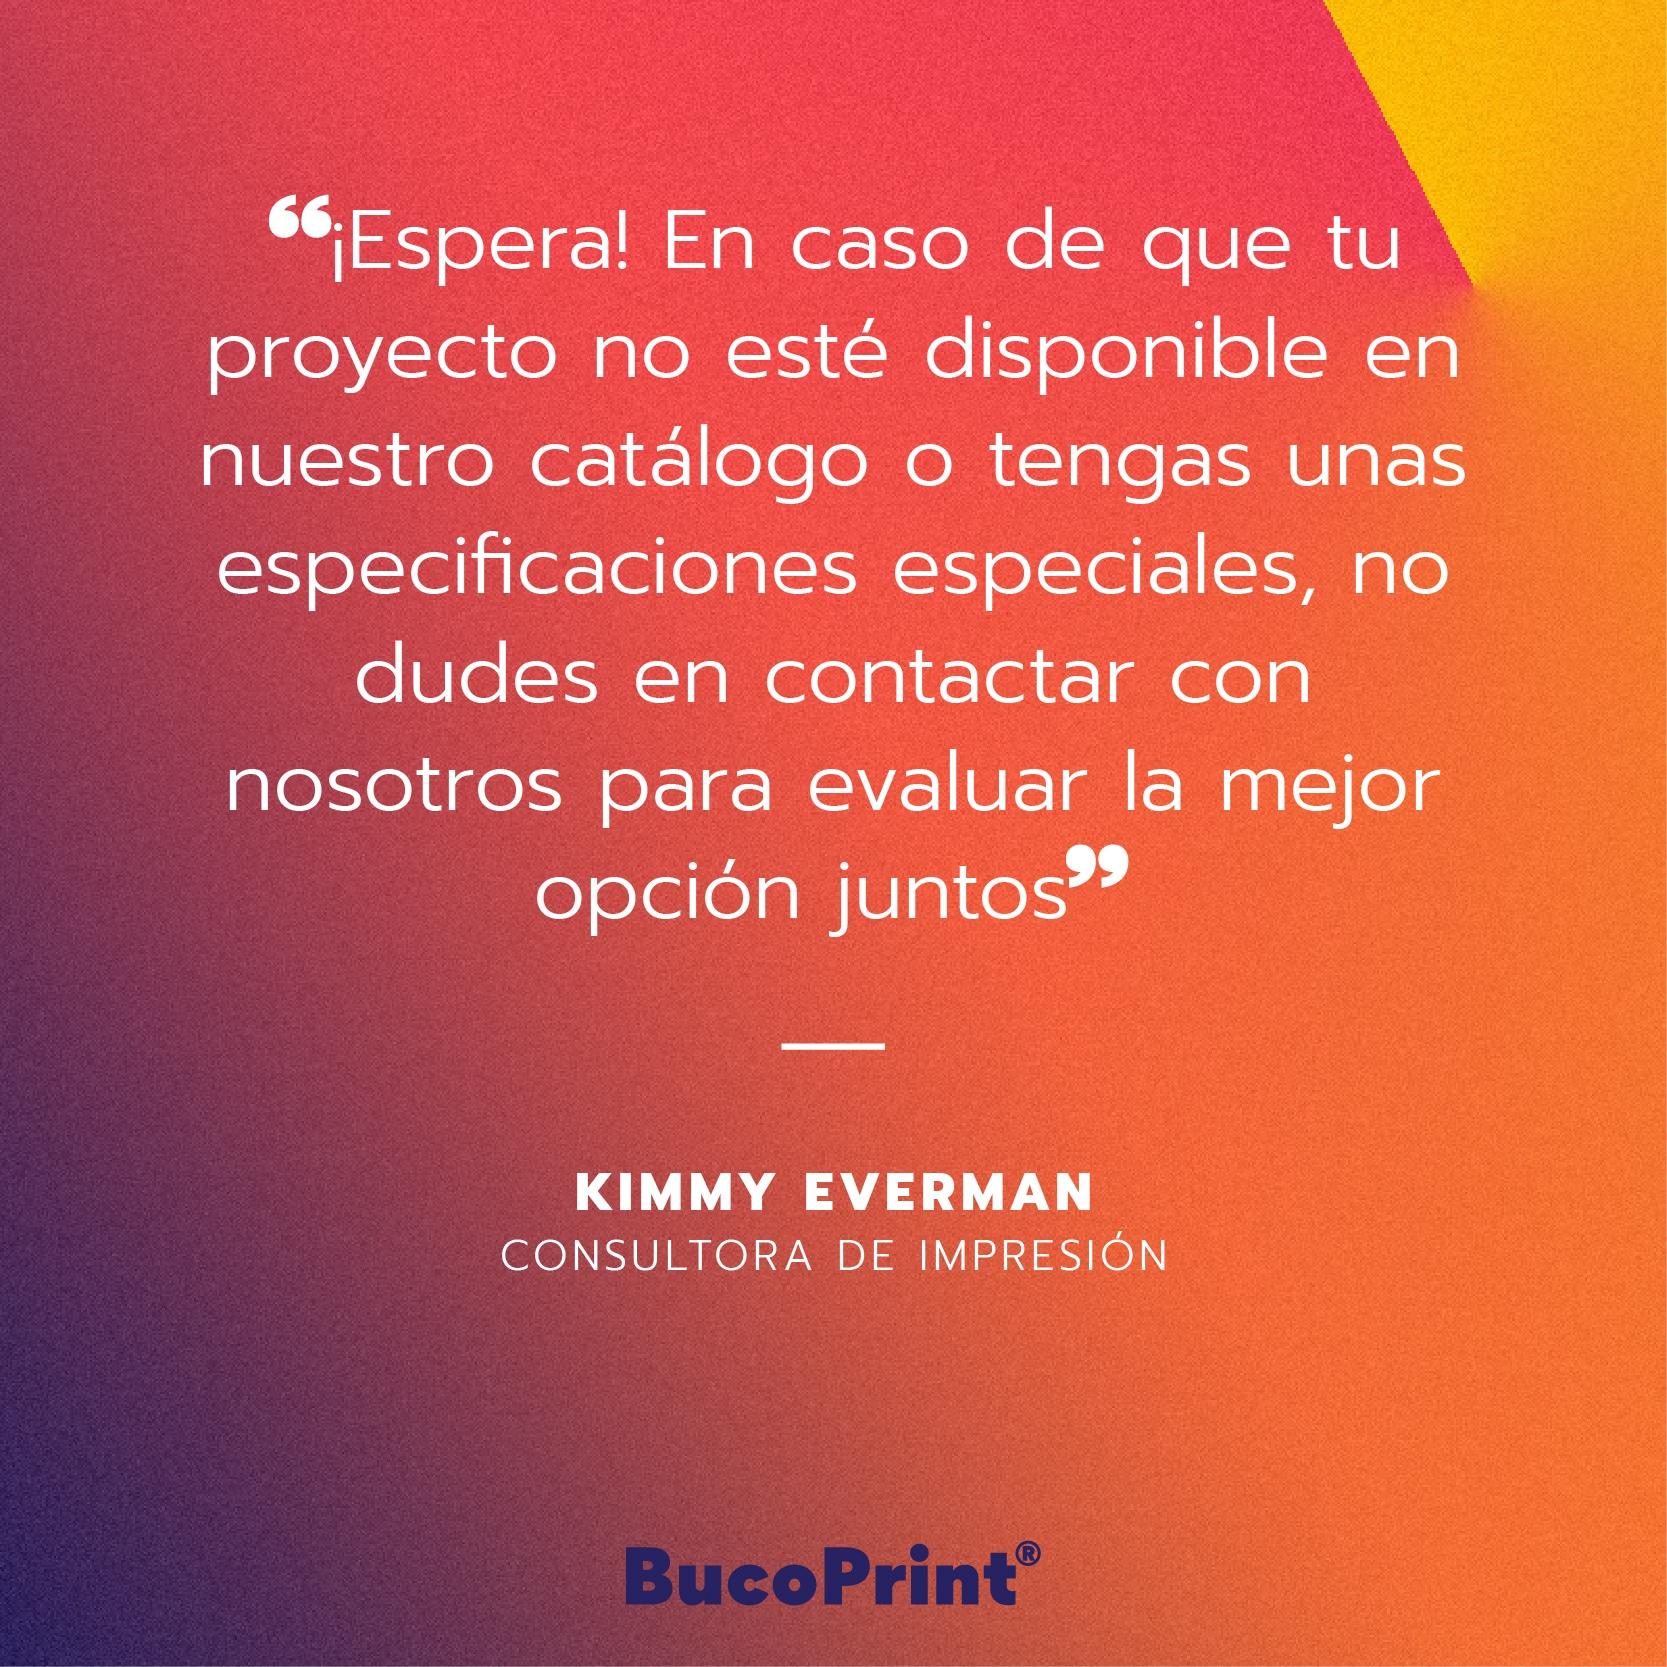 identidad corporativa BucoPrint Panamá